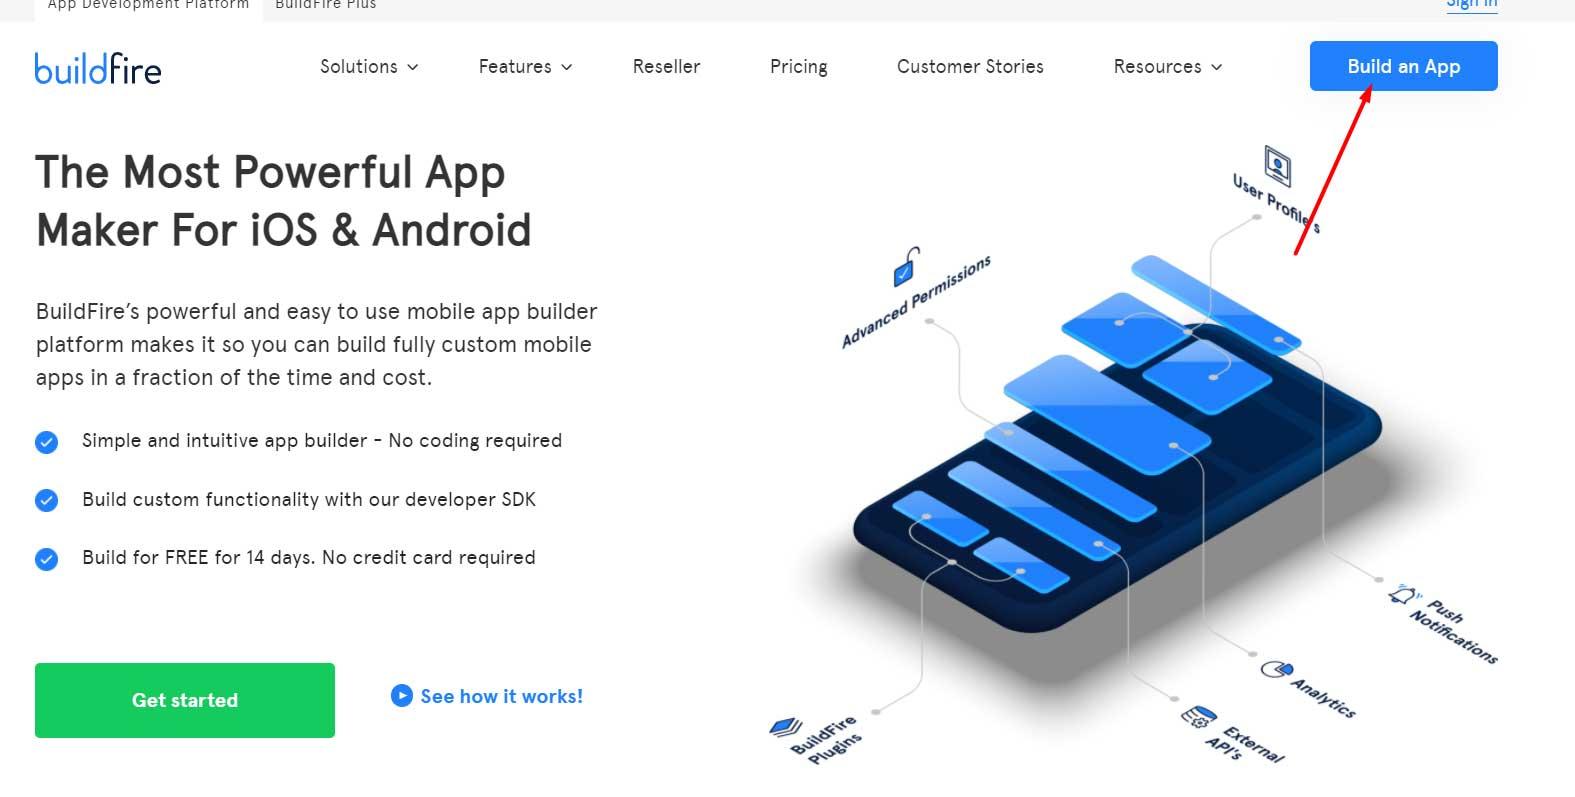 buildfire-built-an-app